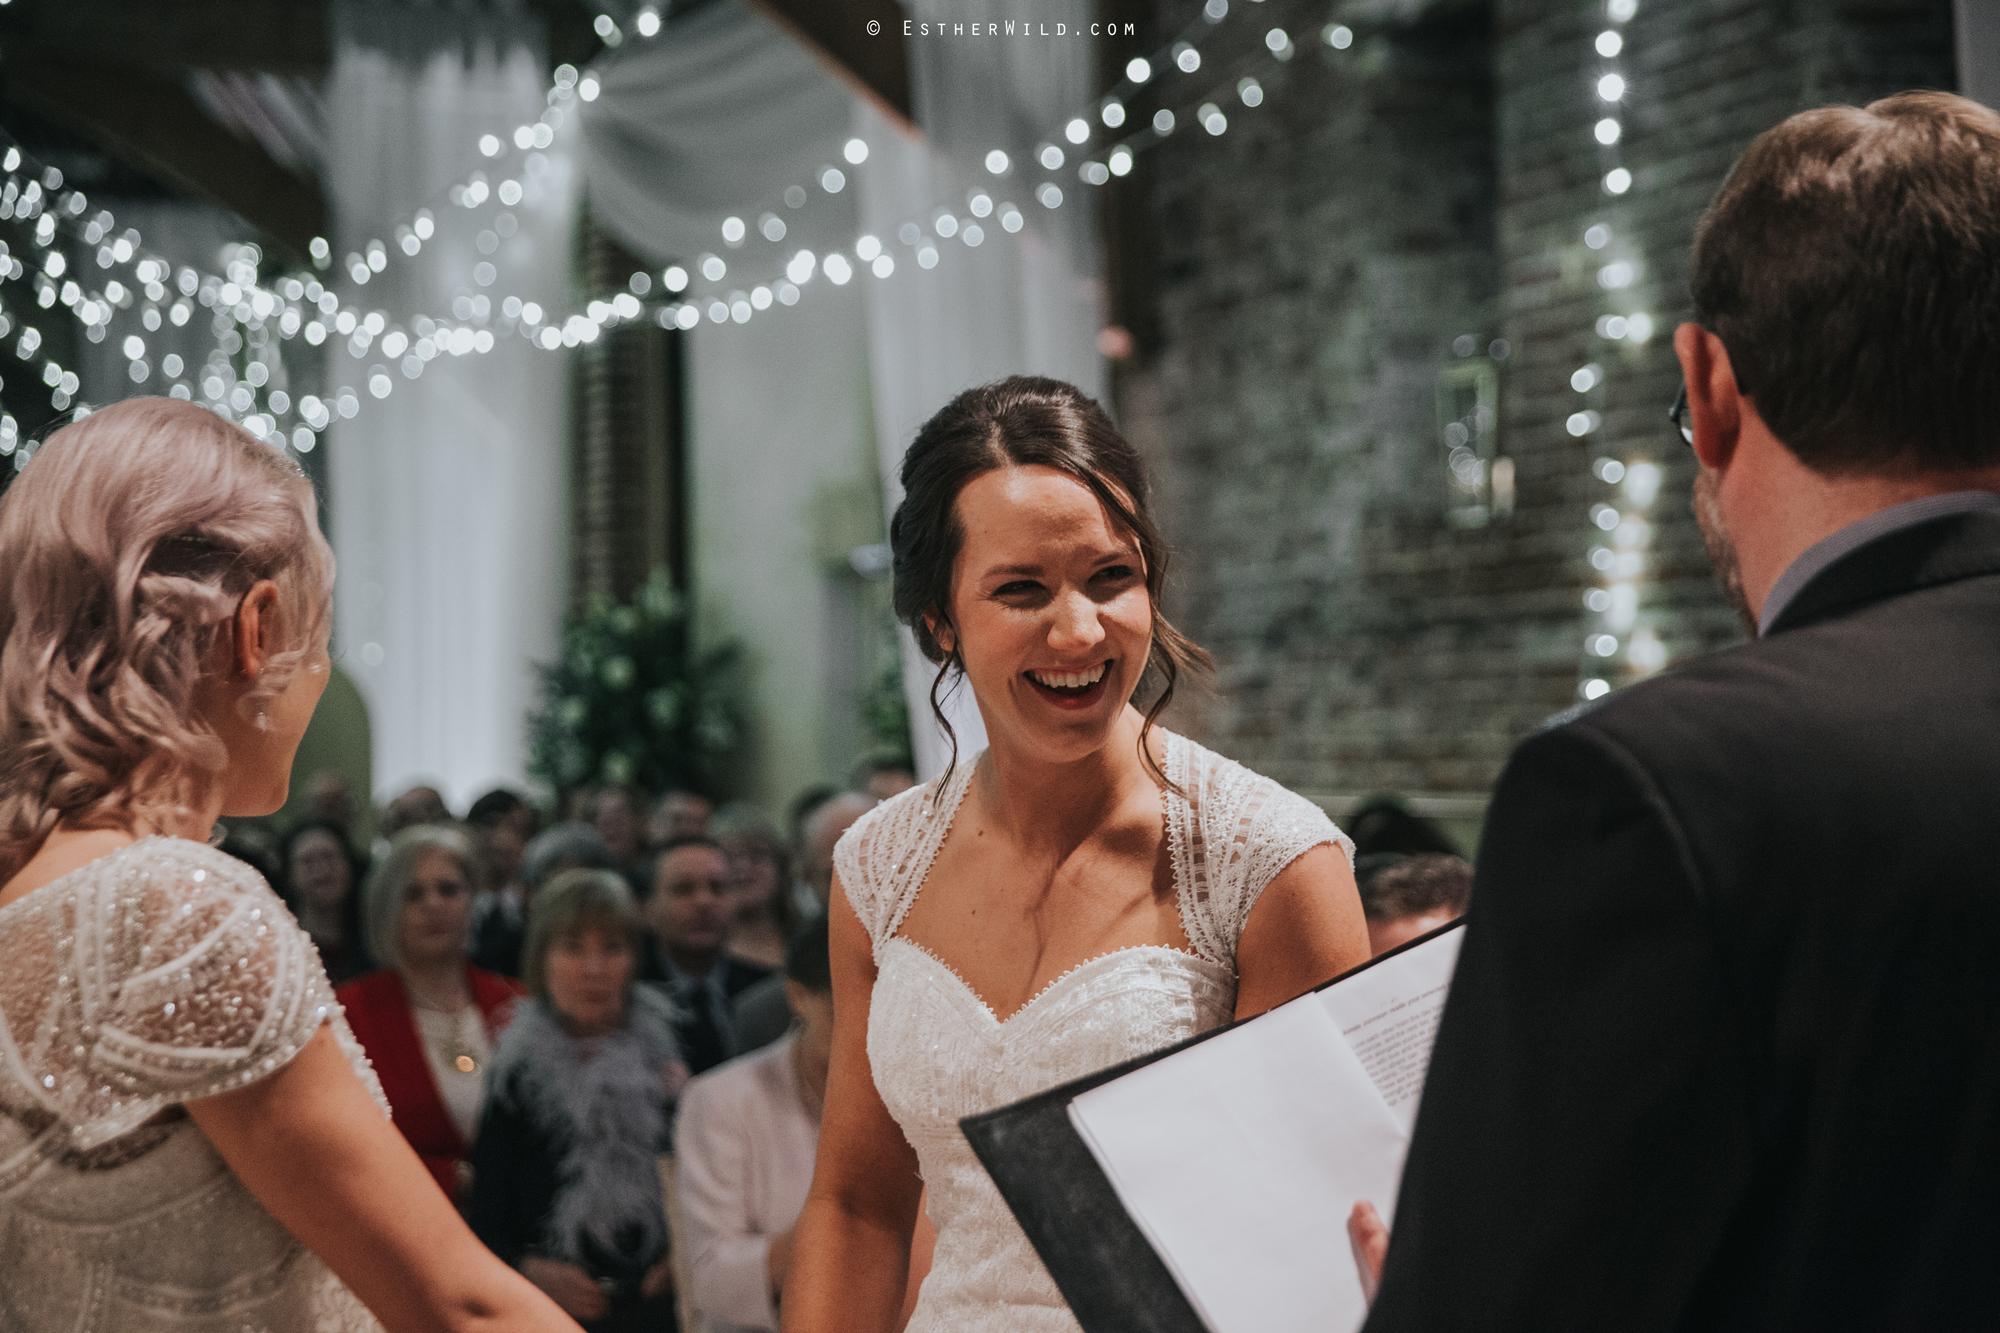 Elms_Barn_Weddings_Suffolk_Photographer_Copyright_Esther_Wild_IMG_1202.jpg